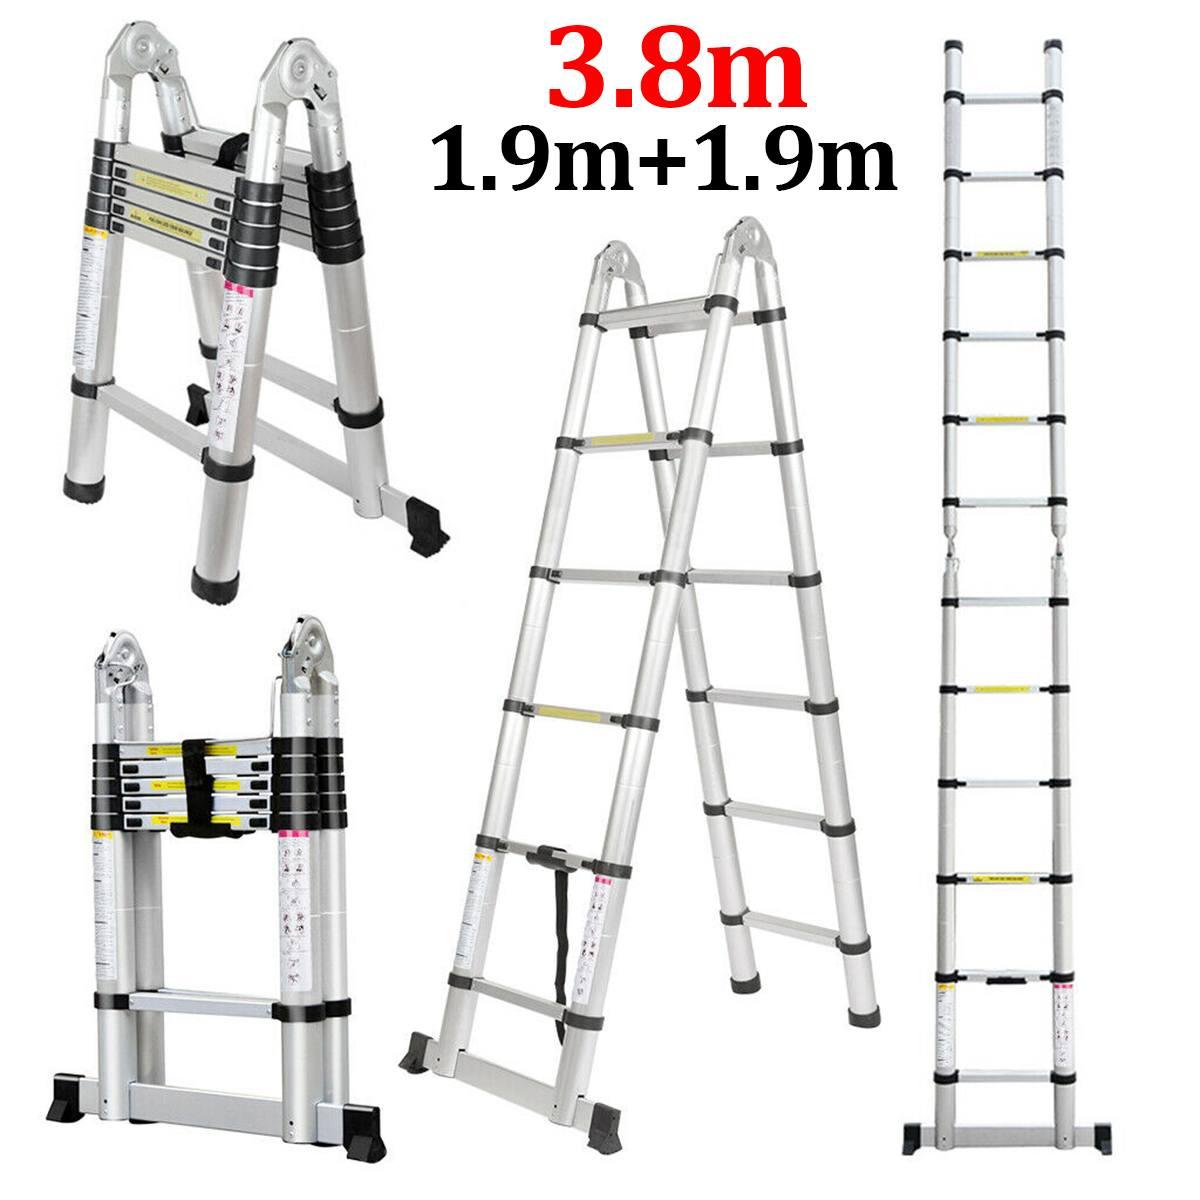 Ladder Telescopic 1.9m+1.9m 12.5FT Folding Ladder Dual-Use Herringbone Ladders Single Extension Alloy Aluminium Tools Home